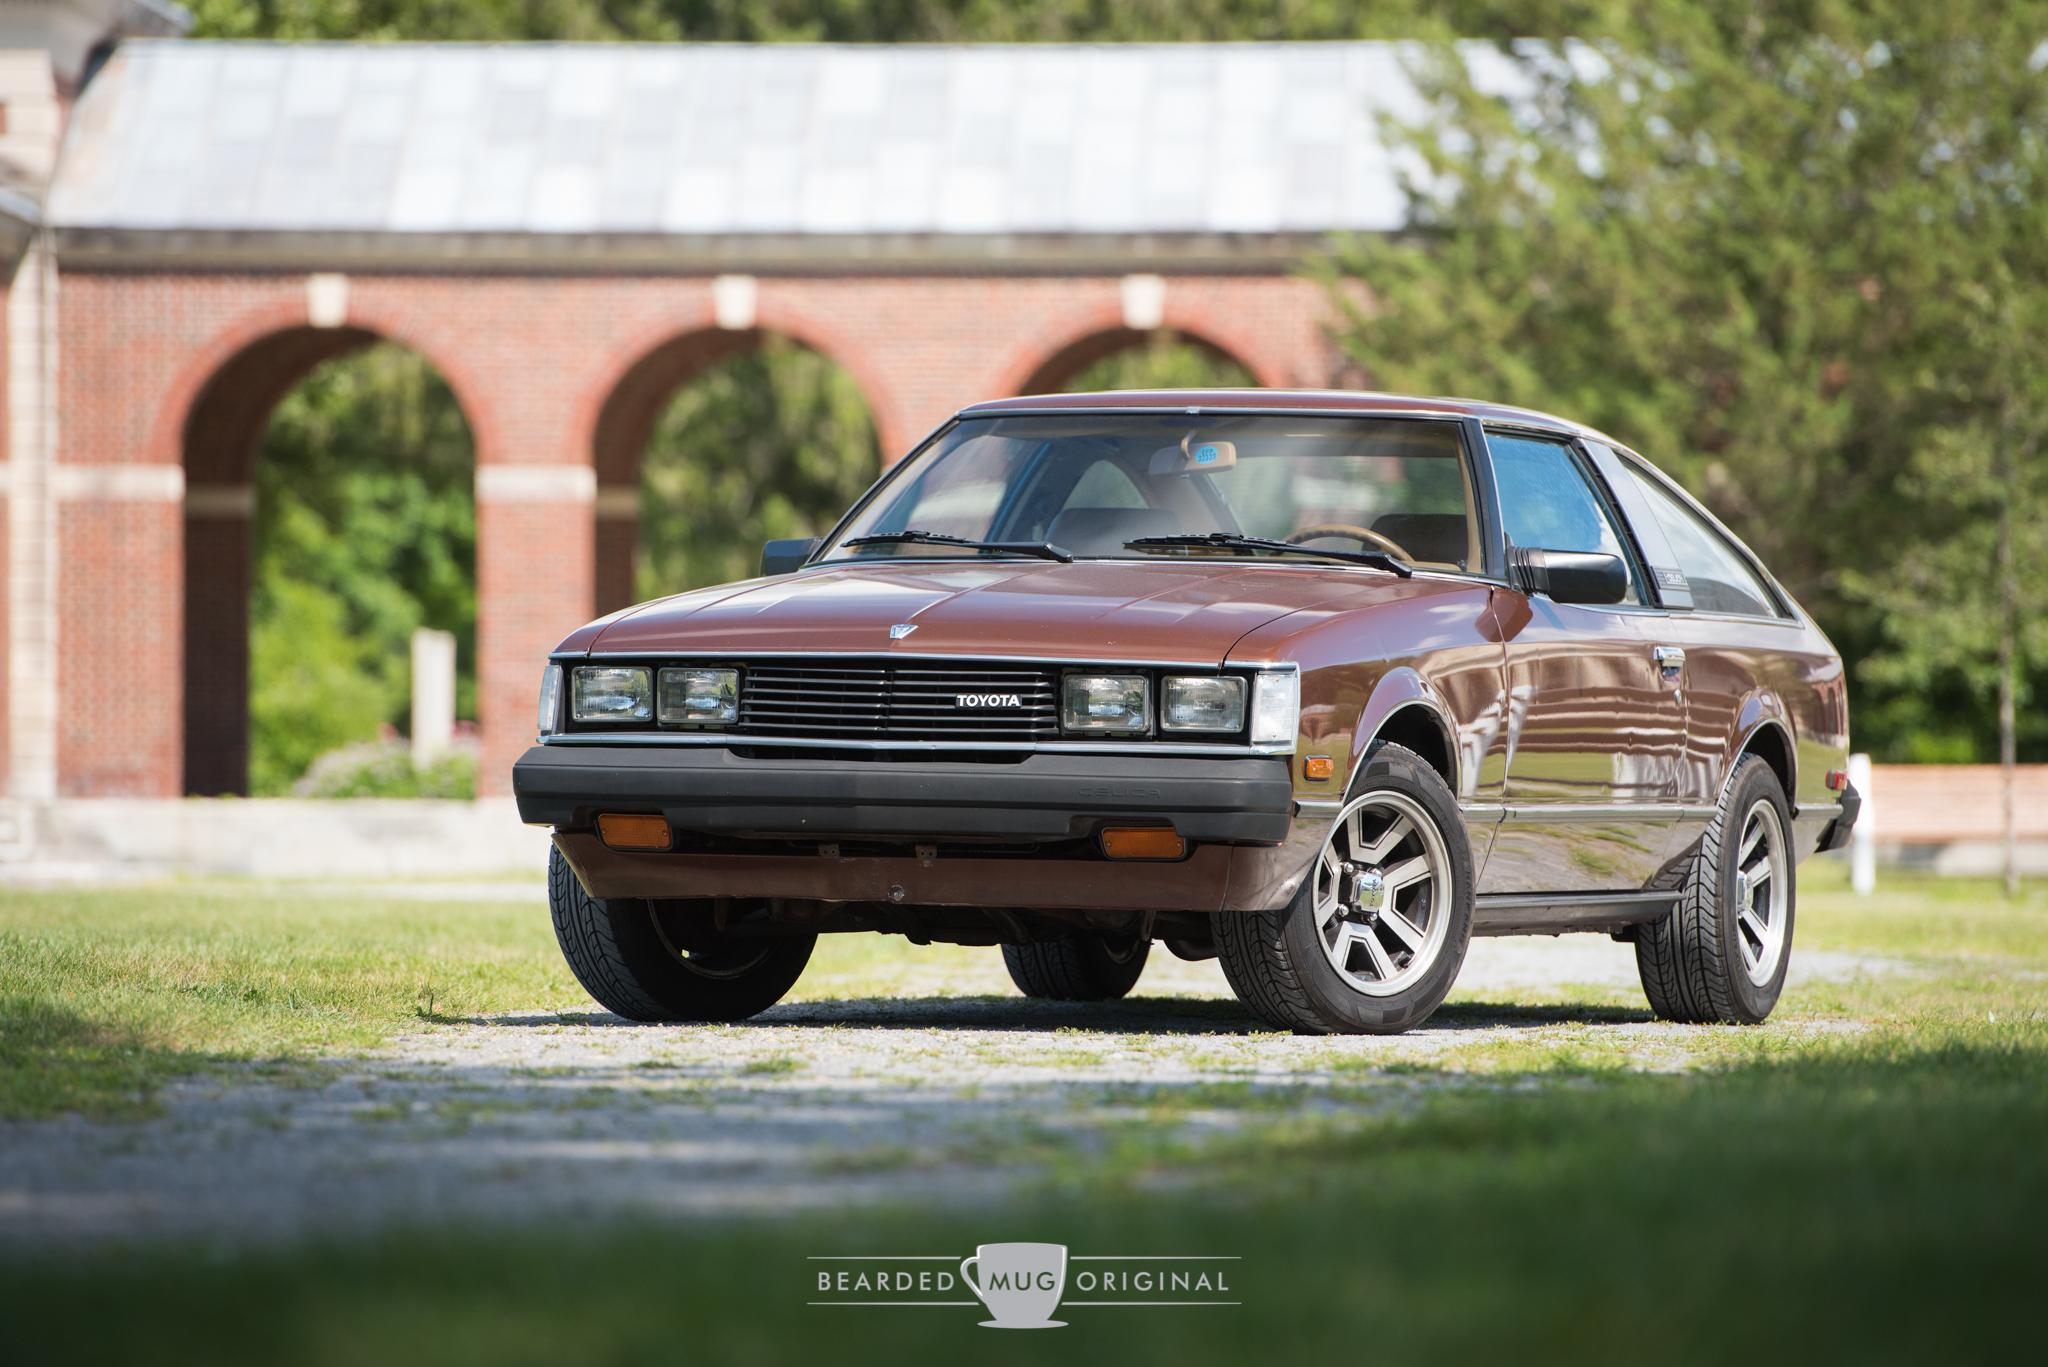 My 1981 Toyota Celica GT liftback made the trip to Saratoga Springs a breeze.